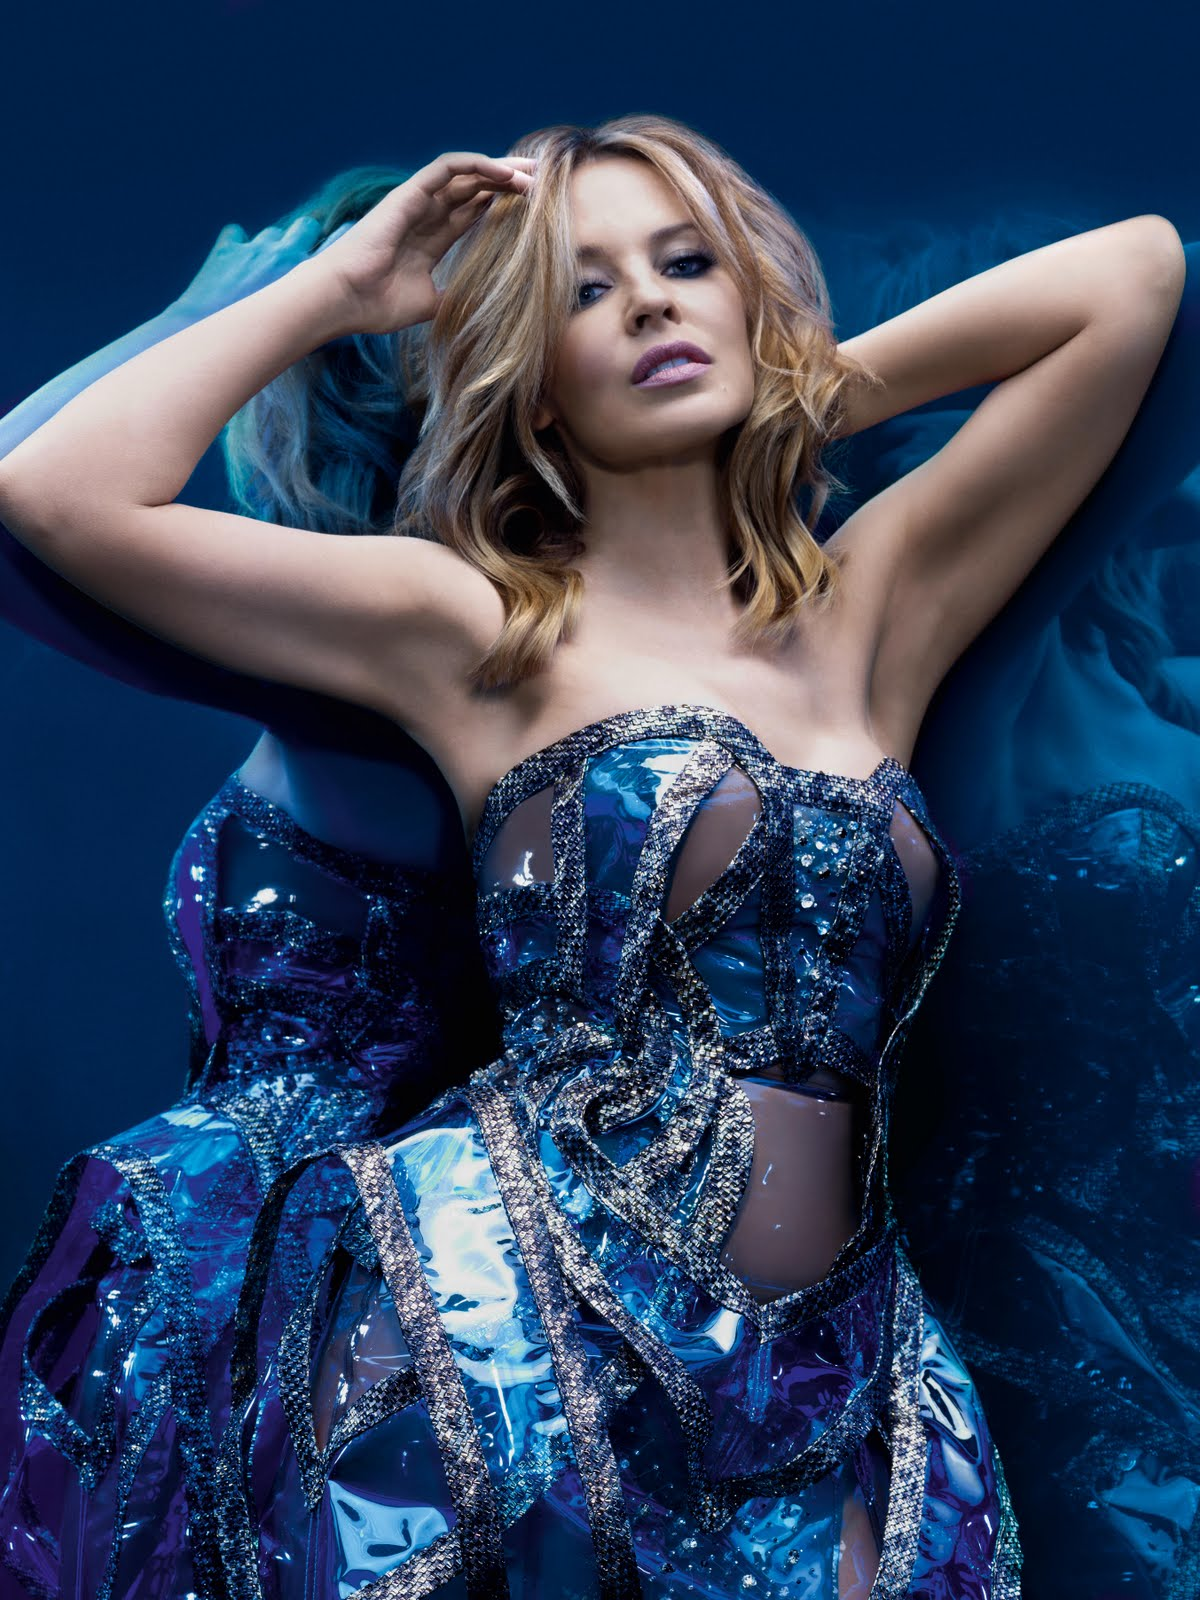 http://4.bp.blogspot.com/_ZRj5nlc3sp8/TCR0vKkpM1I/AAAAAAAAJak/KTs-AyVVho8/s1600/Kylie+Minogue+Aphrodite+Music+Album+Pics+8.jpg